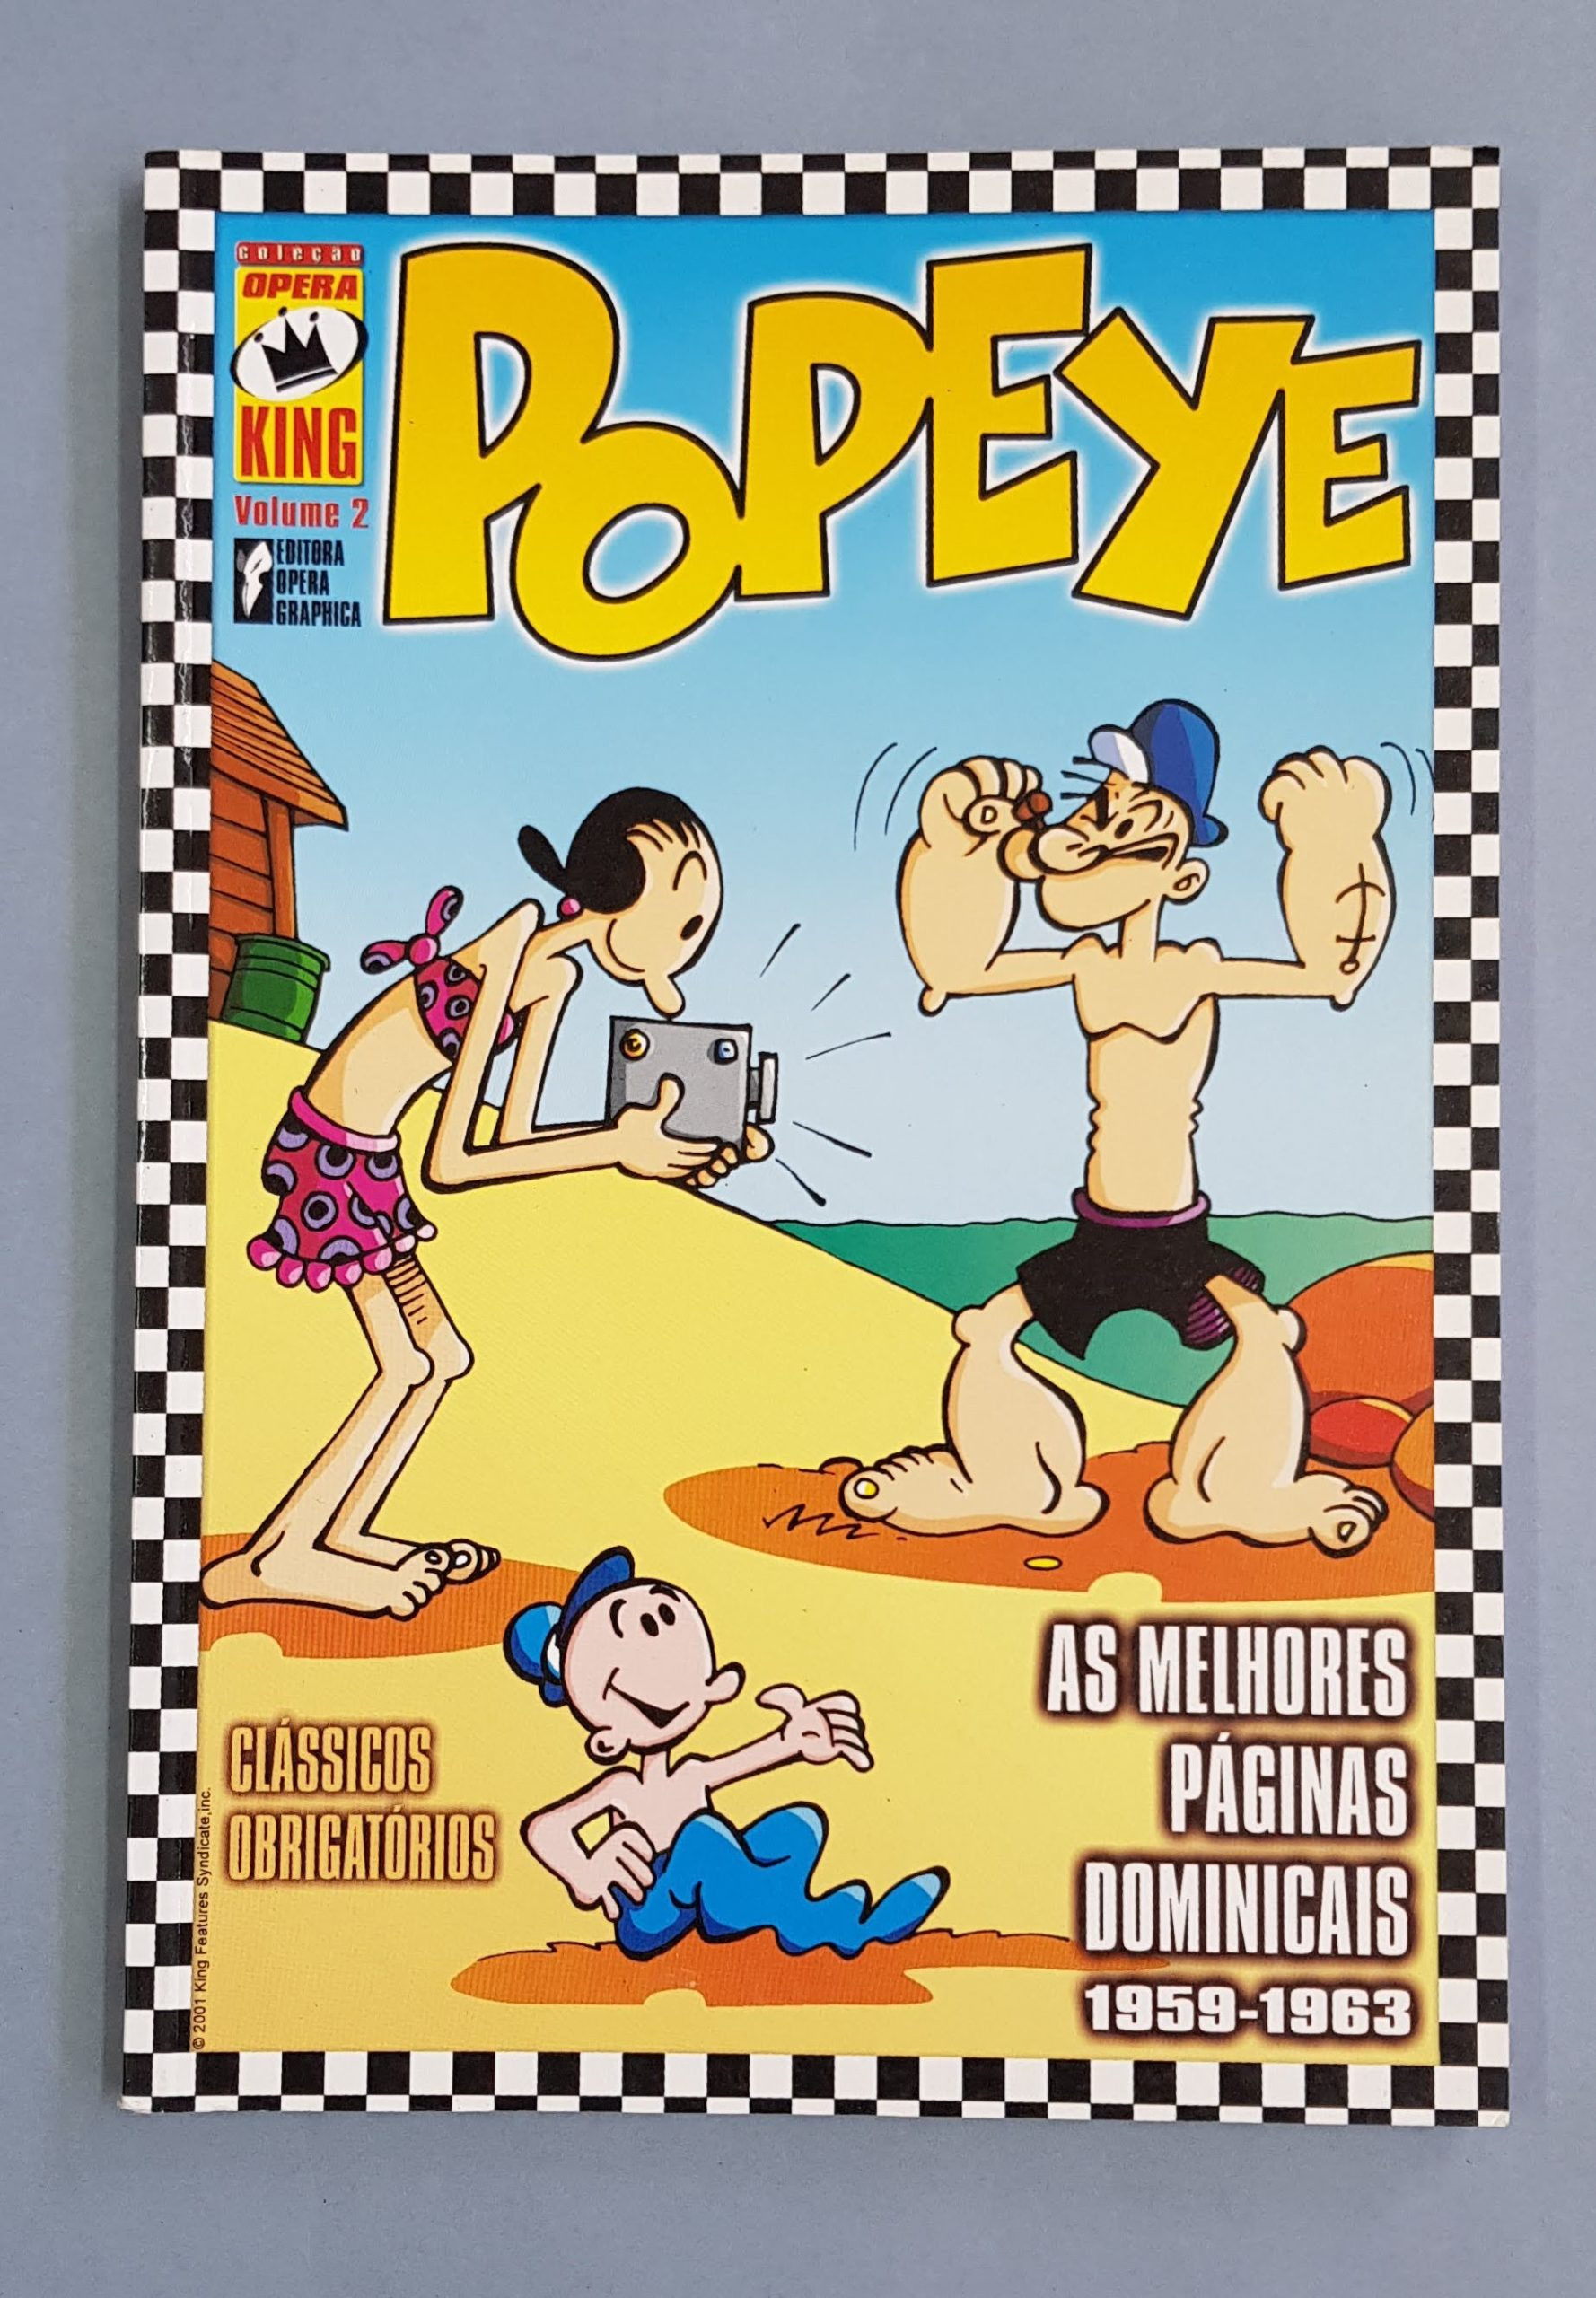 Colecção Ópera King – Popeye